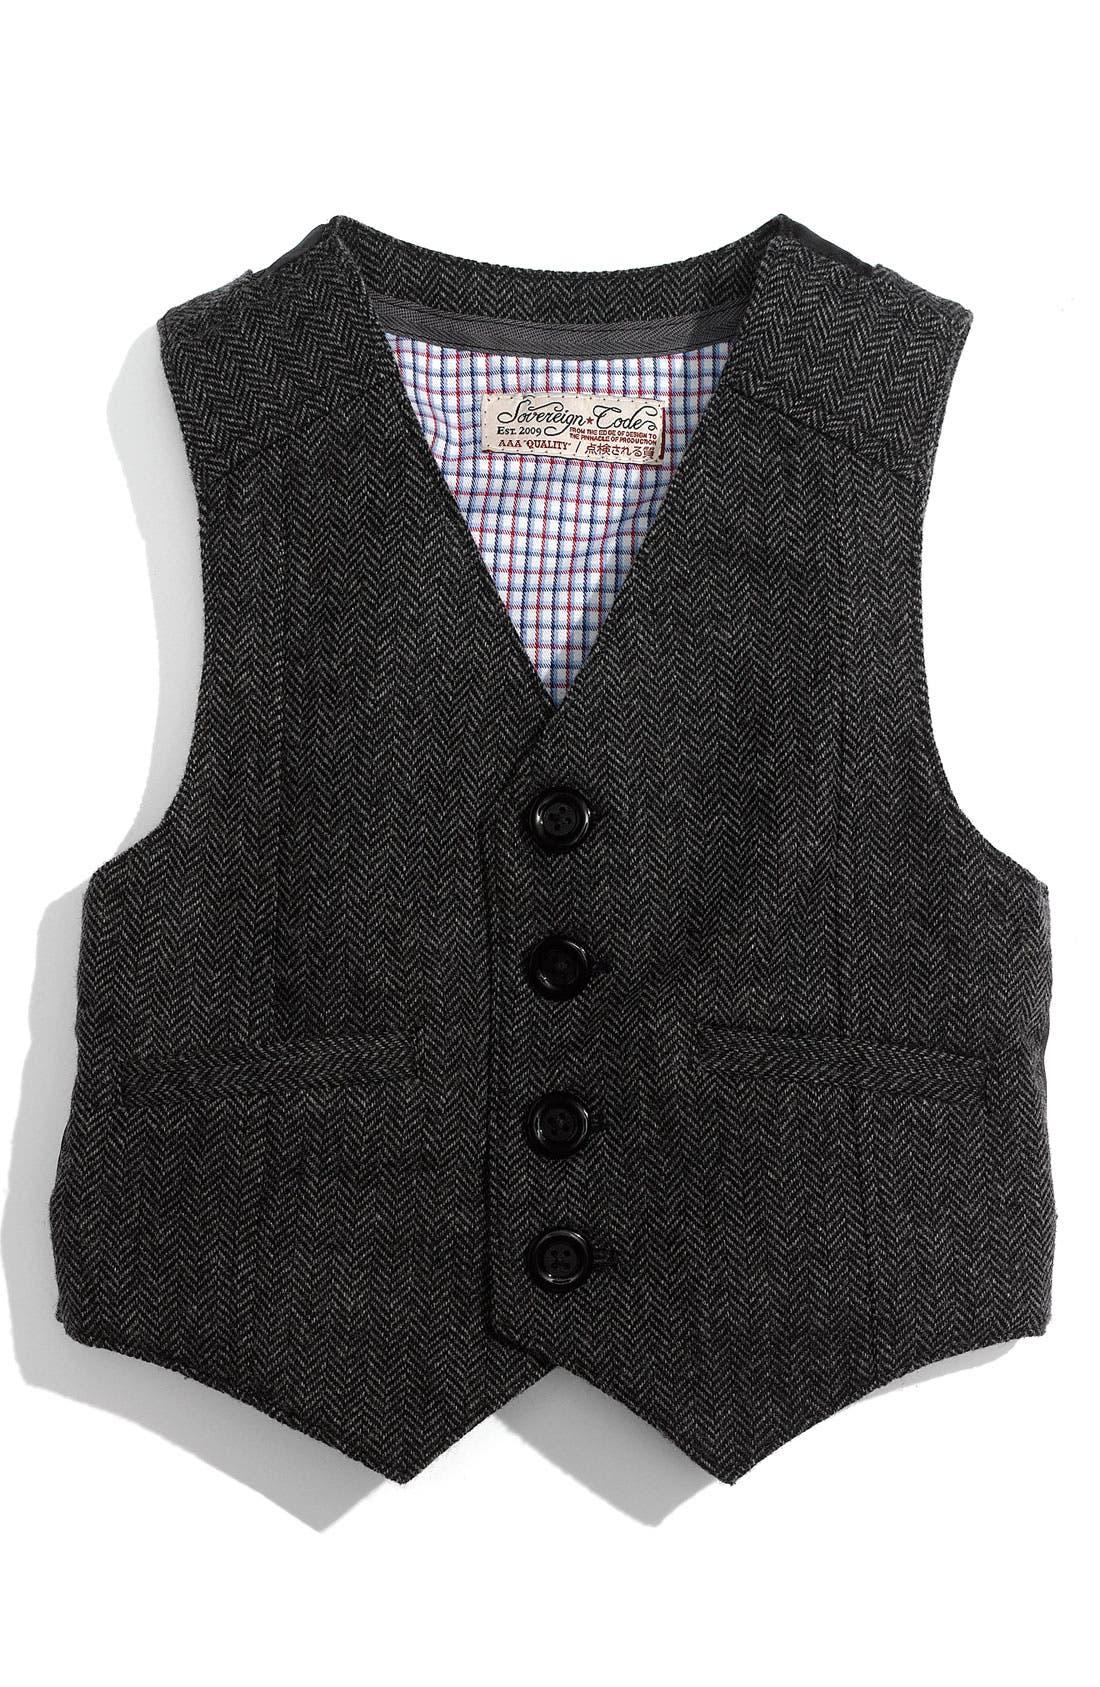 Alternate Image 1 Selected - Sovereign Code 'Lucas' Vest (Infant)